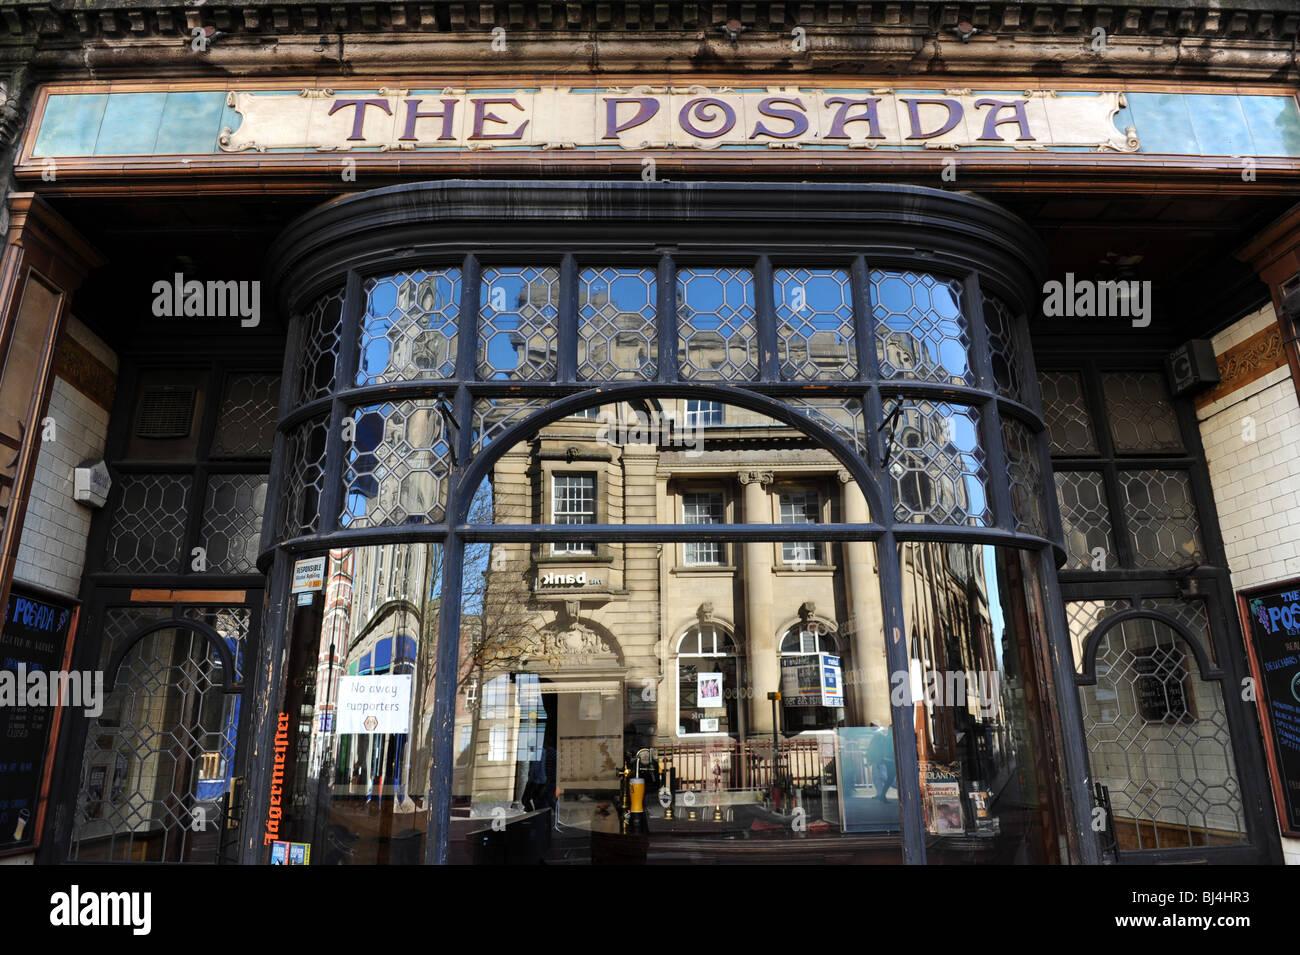 The Posada Pub in Lichfield Street Wolverhampton Uk - Stock Image